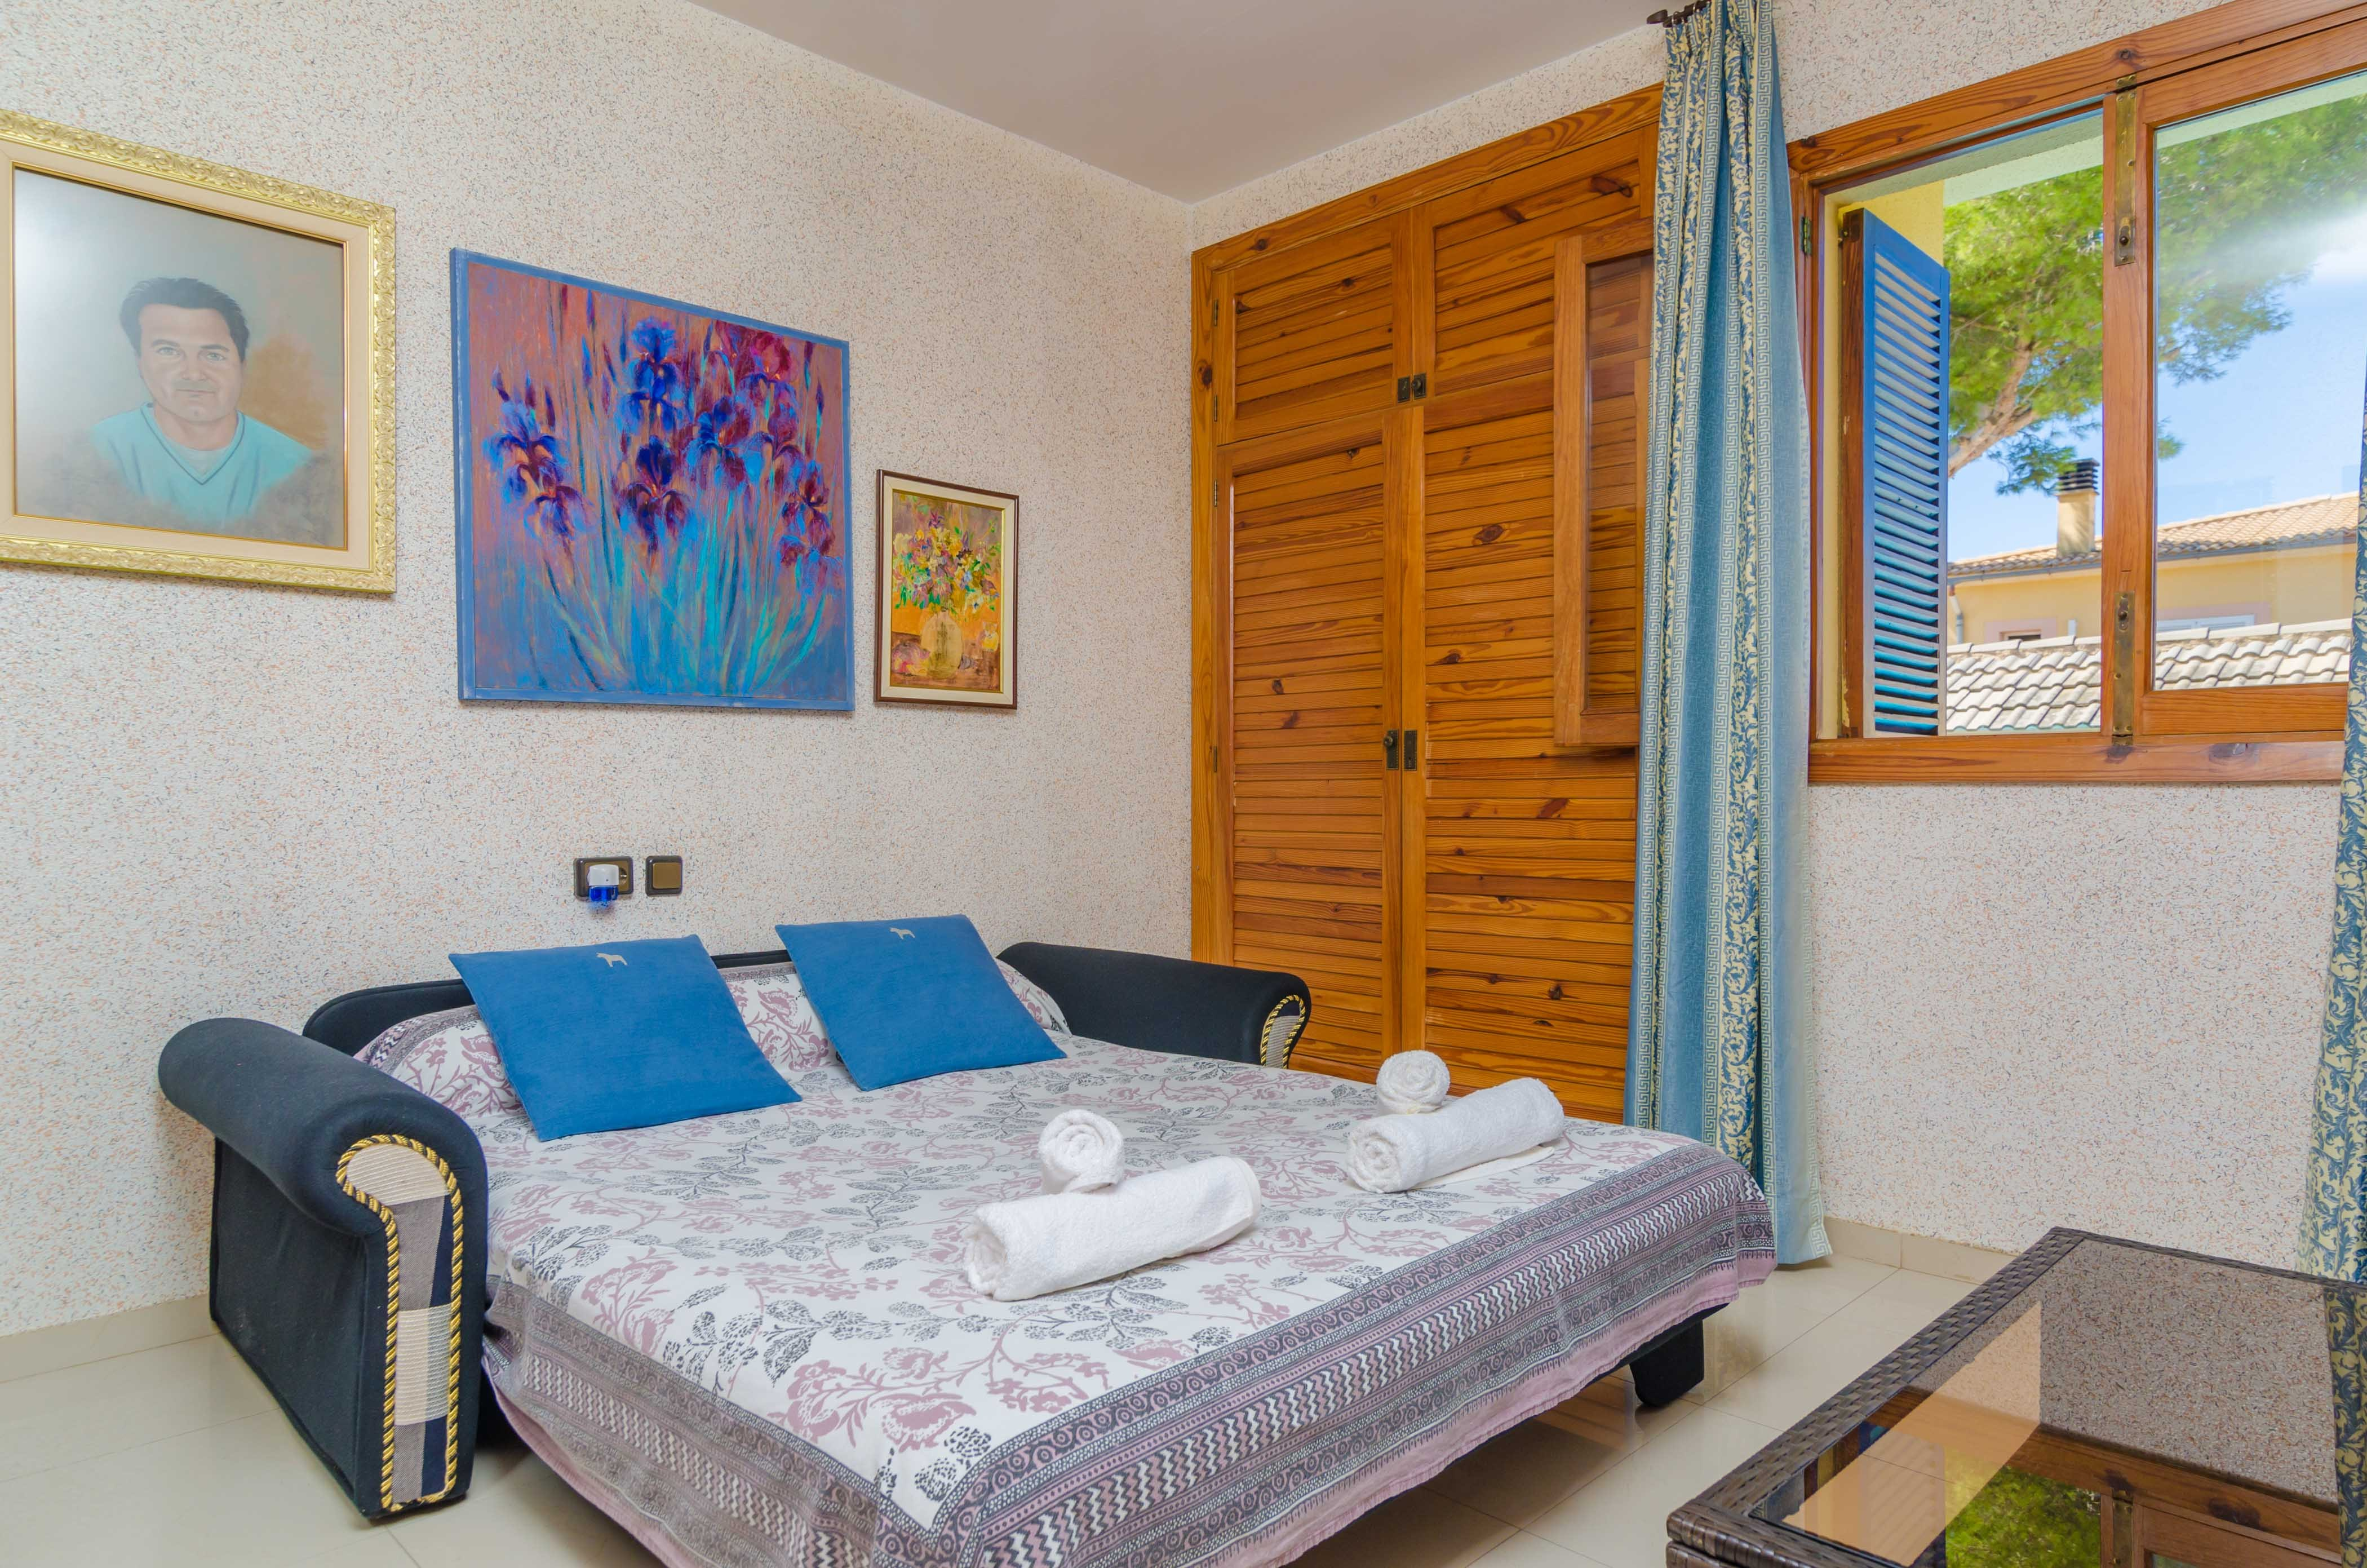 Ferienhaus CAN GORI (2296828), Badia Gran, Mallorca, Balearische Inseln, Spanien, Bild 23